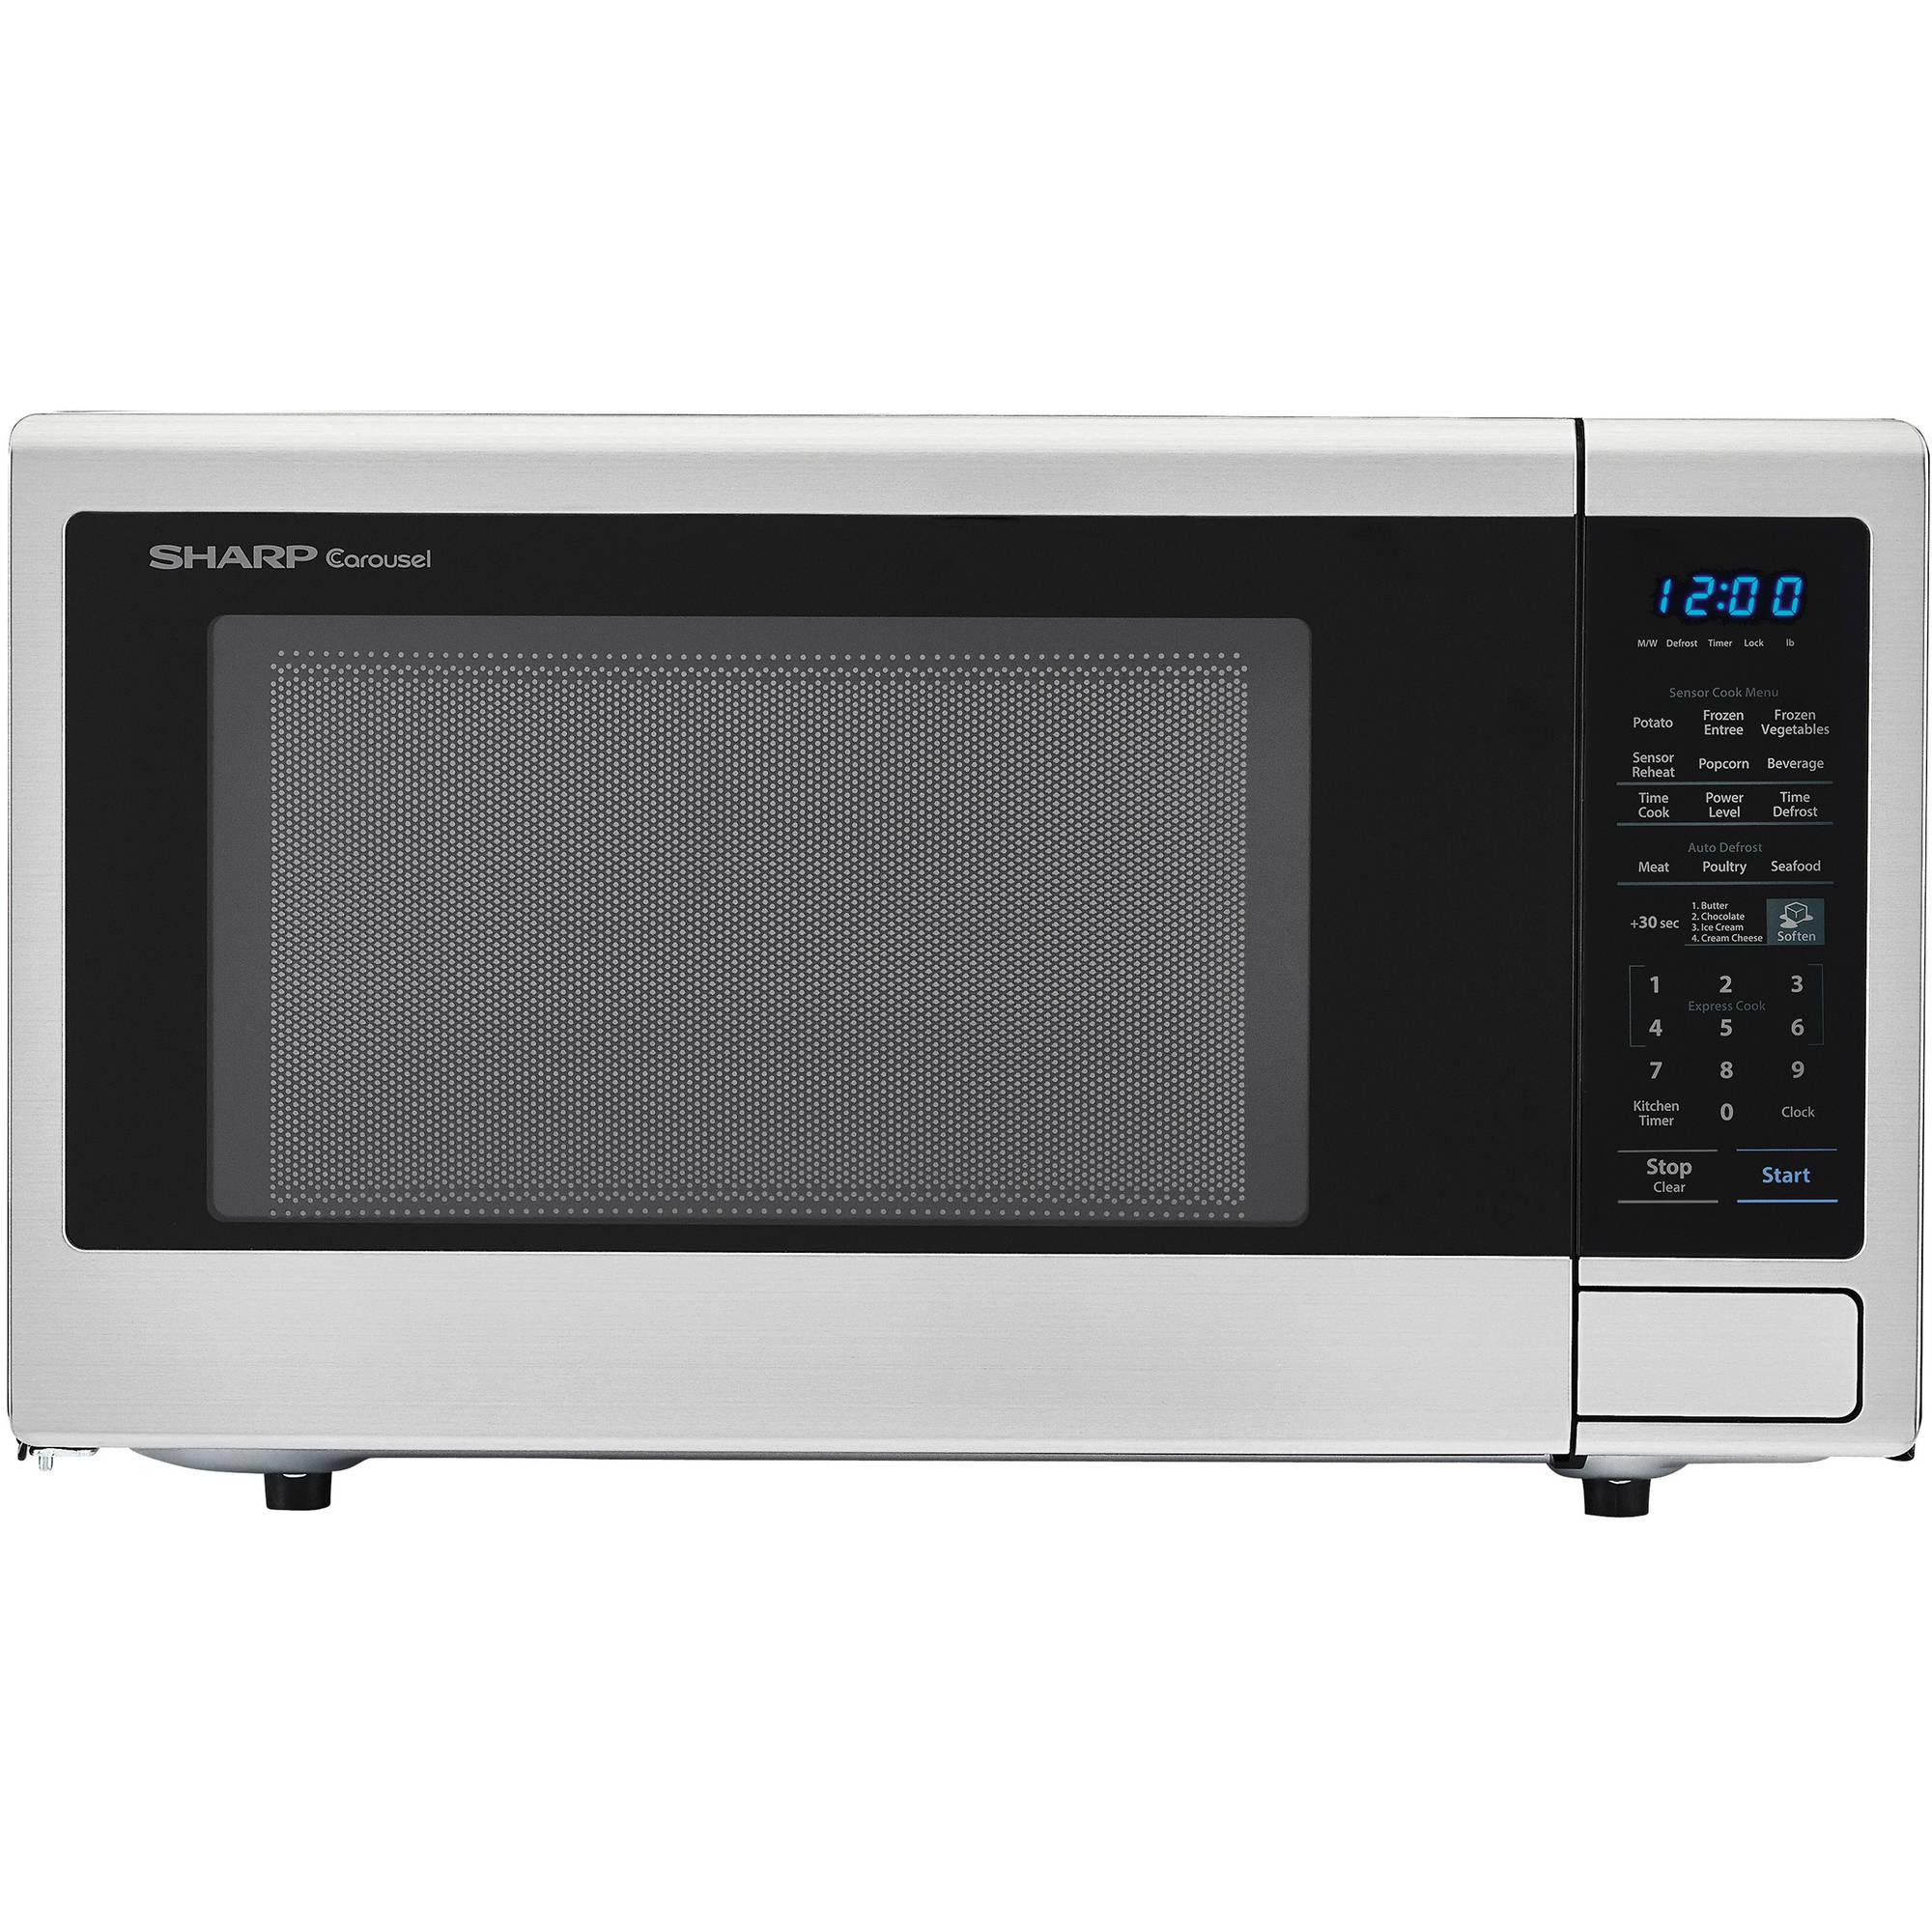 YMMV Sharp SMC1840CS 1.8 cu ft 1100W Microwave, Stainless Steel $79 YMMV